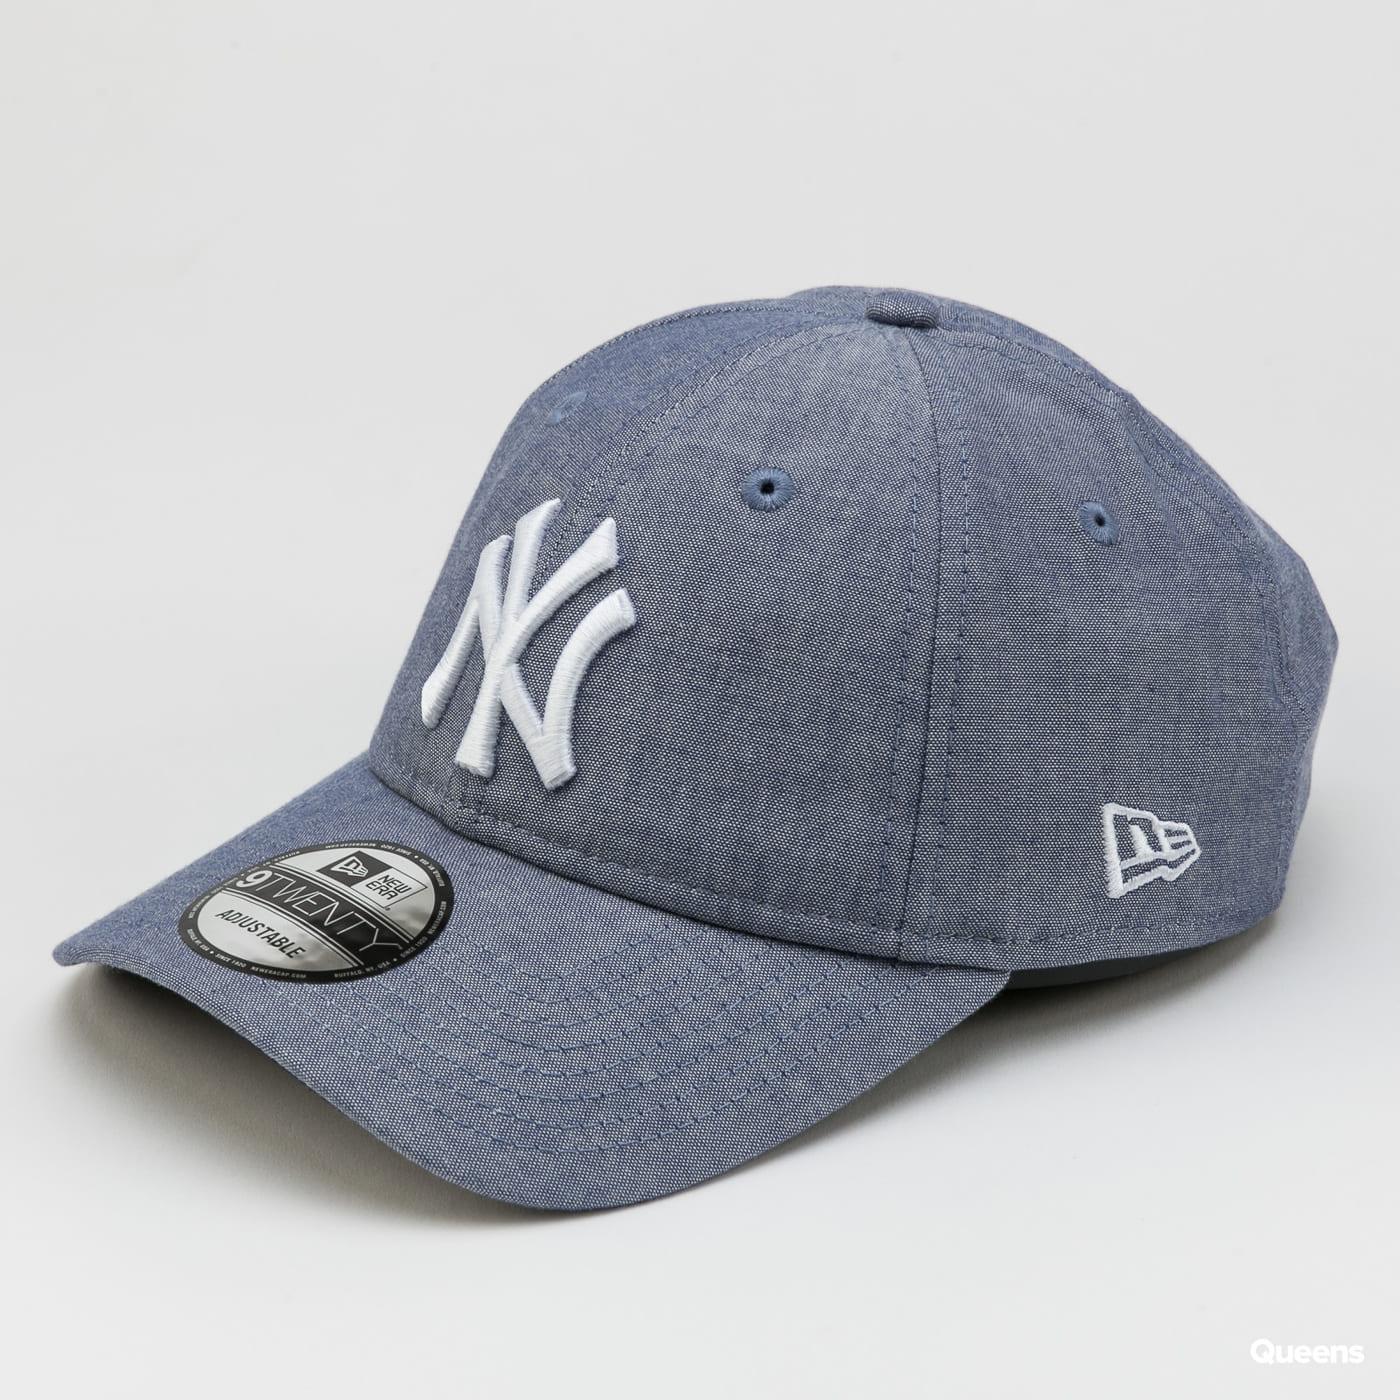 New Era 920 MLB Heritage Licensed NY melange blue